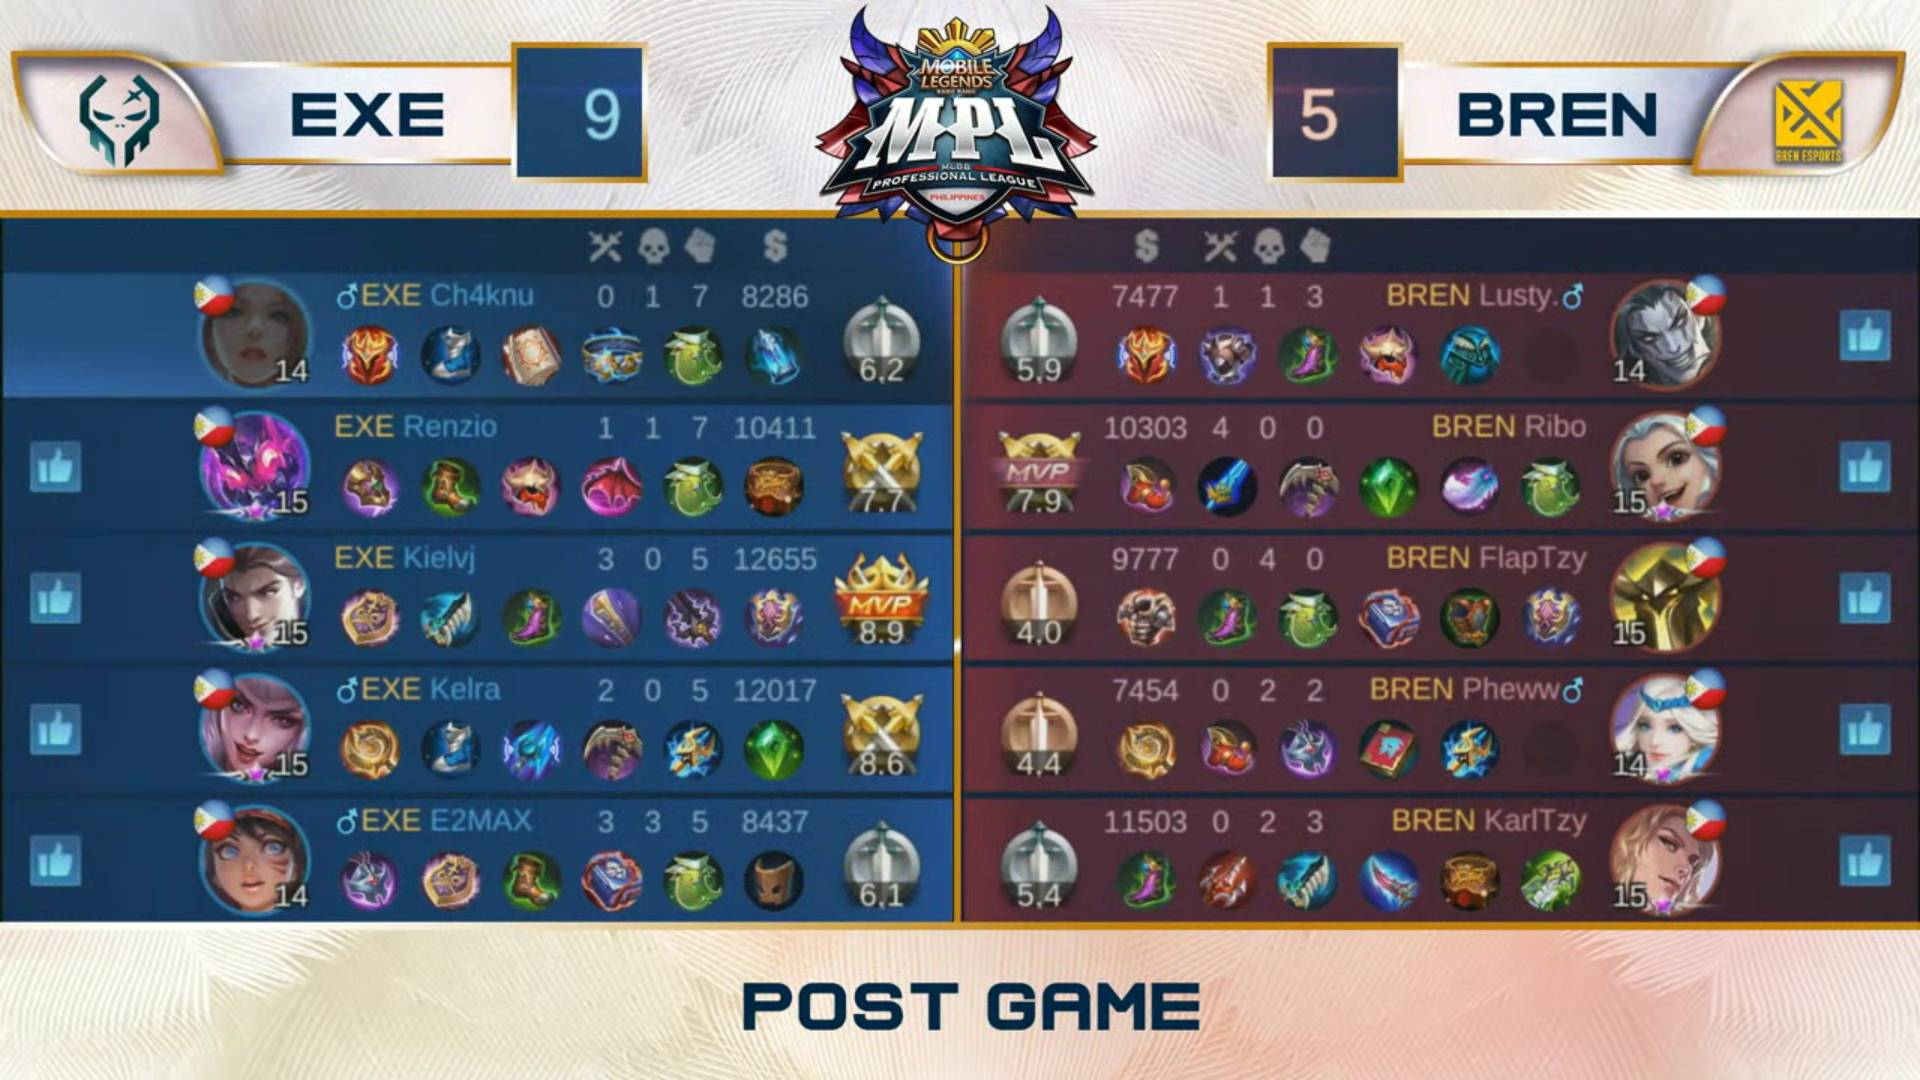 MPL-PH-Season-7-Lower-Bracket-Execration-def-BREN-Game-5 Execration dethrones MPL PH kings Bren ESports Mobile Legends MPL-PH News  - philippine sports news